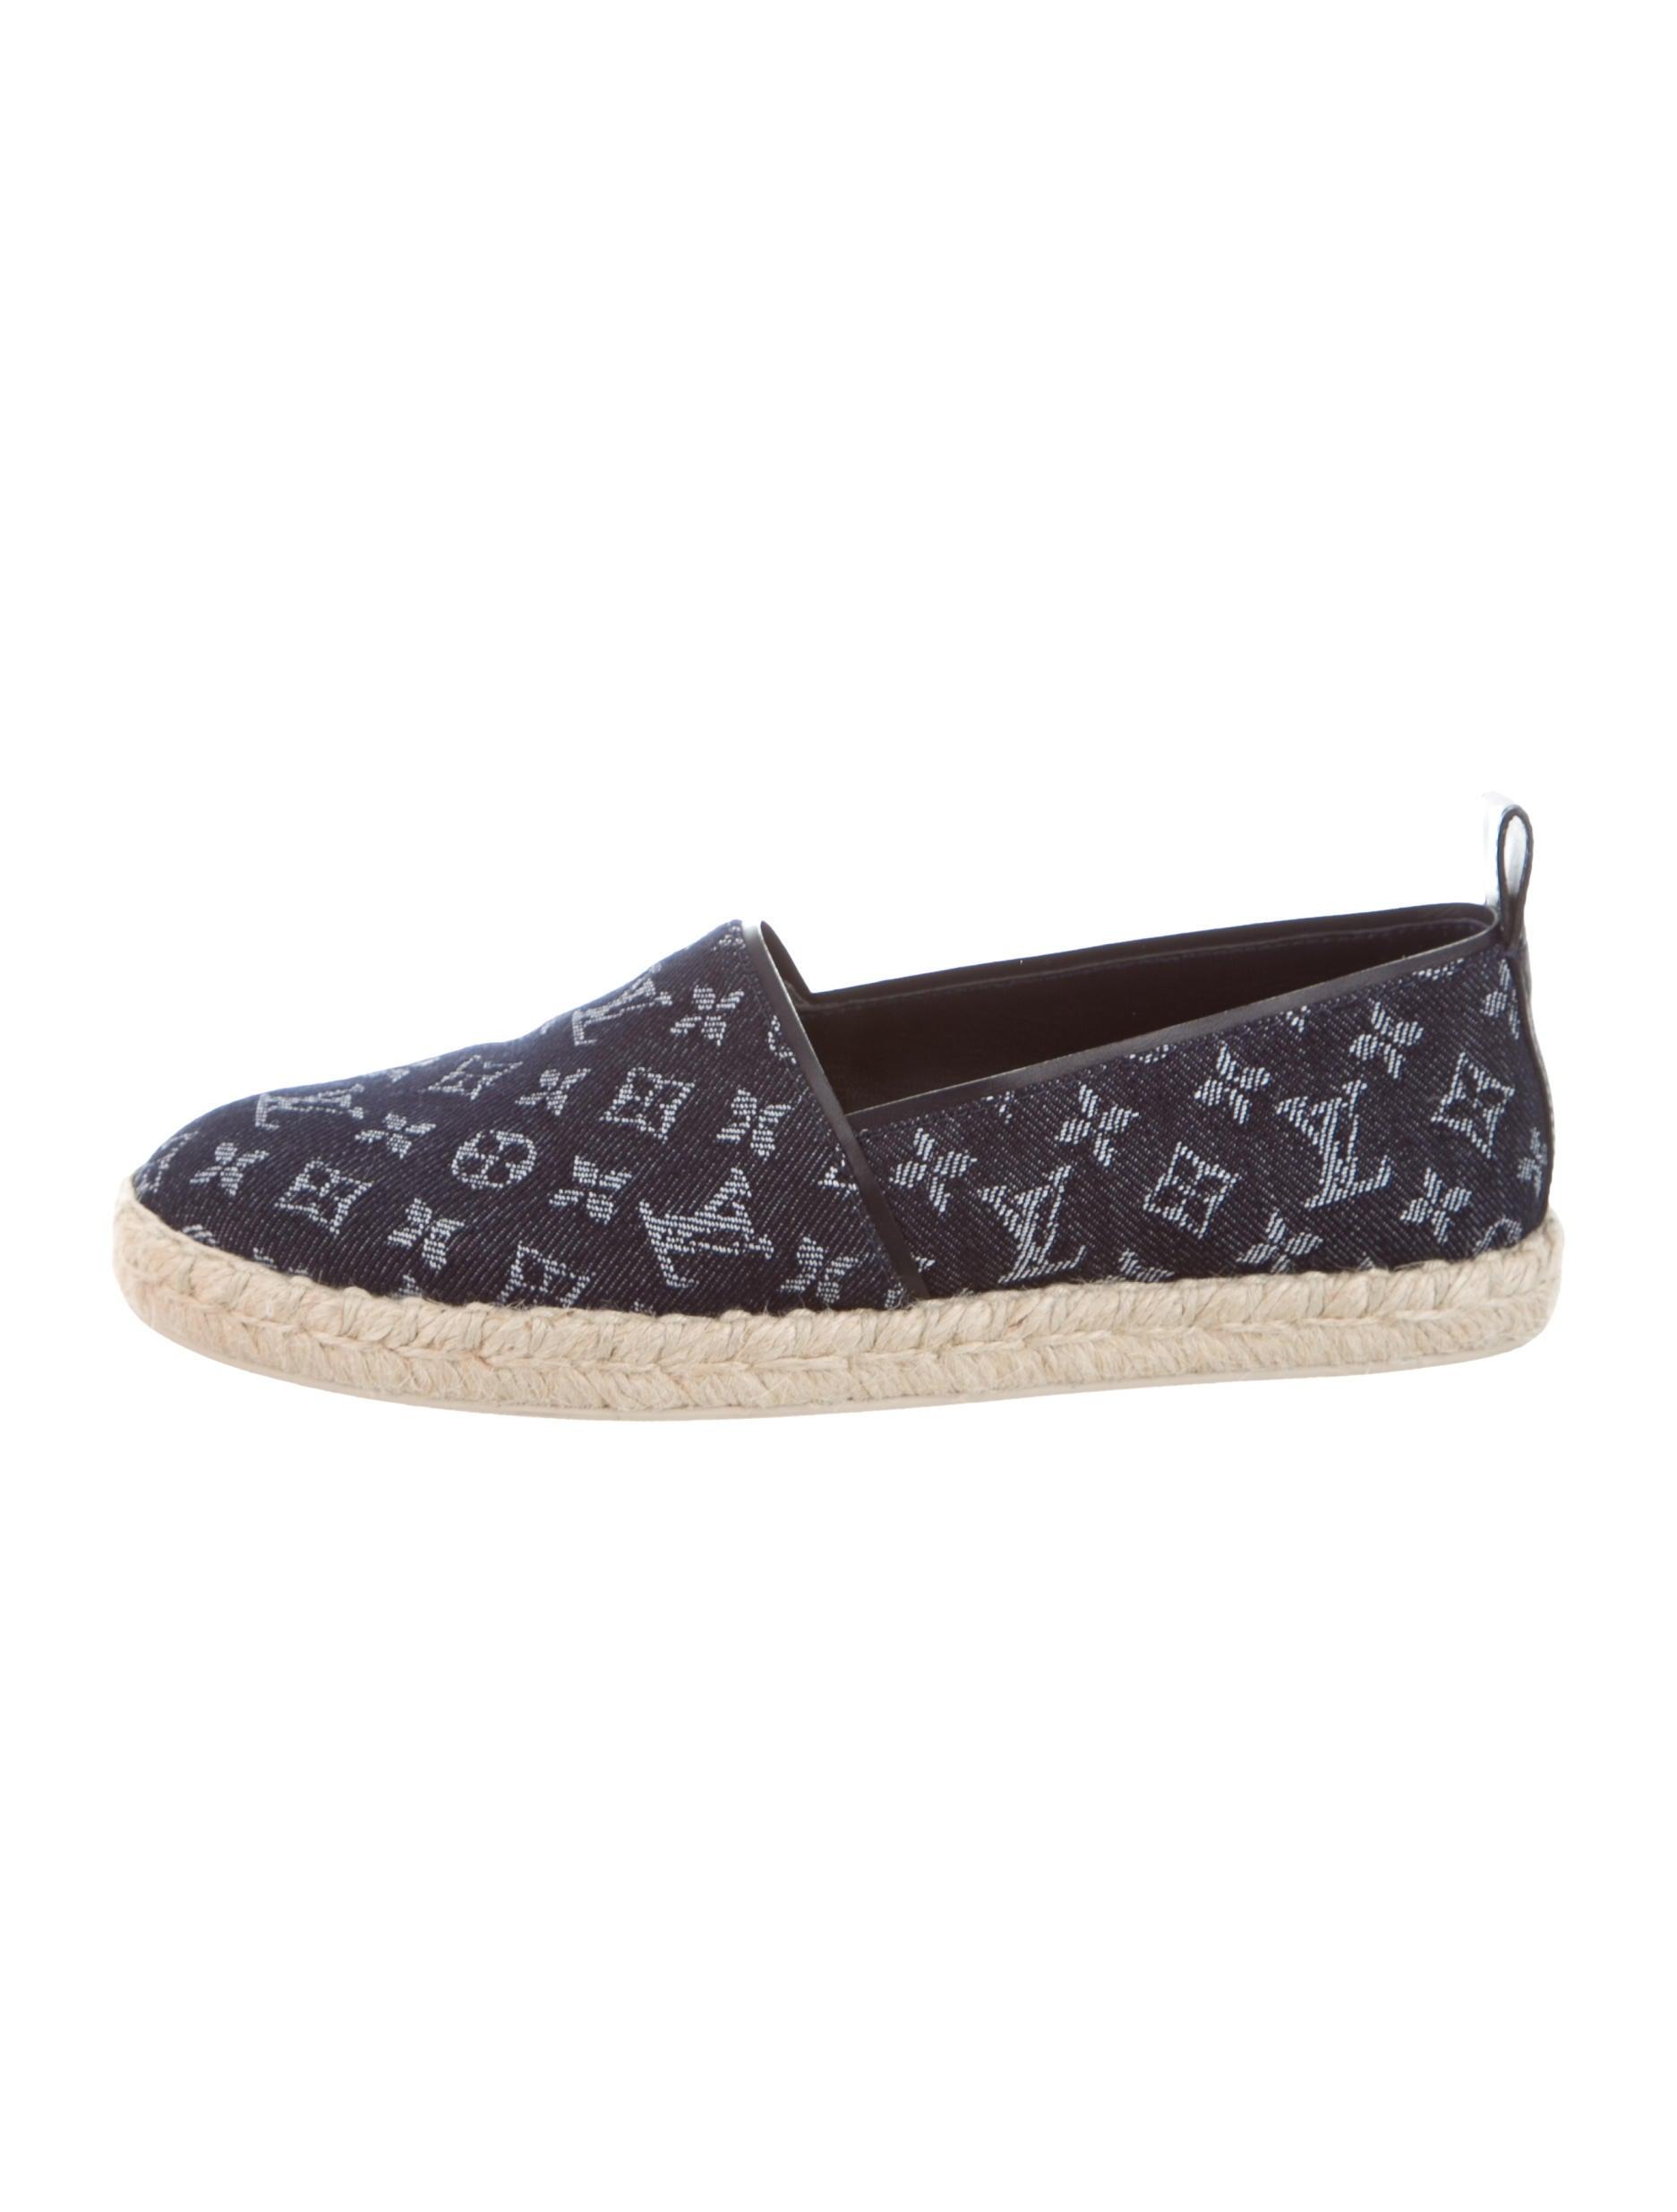 9a0558e09e Shop & Consign. Chanel Beige Burlap and Leather Lace Up Sneakers. Buy Louis  Vuitton Denim Monogram Espadrilles Wedge Sandals Size ...